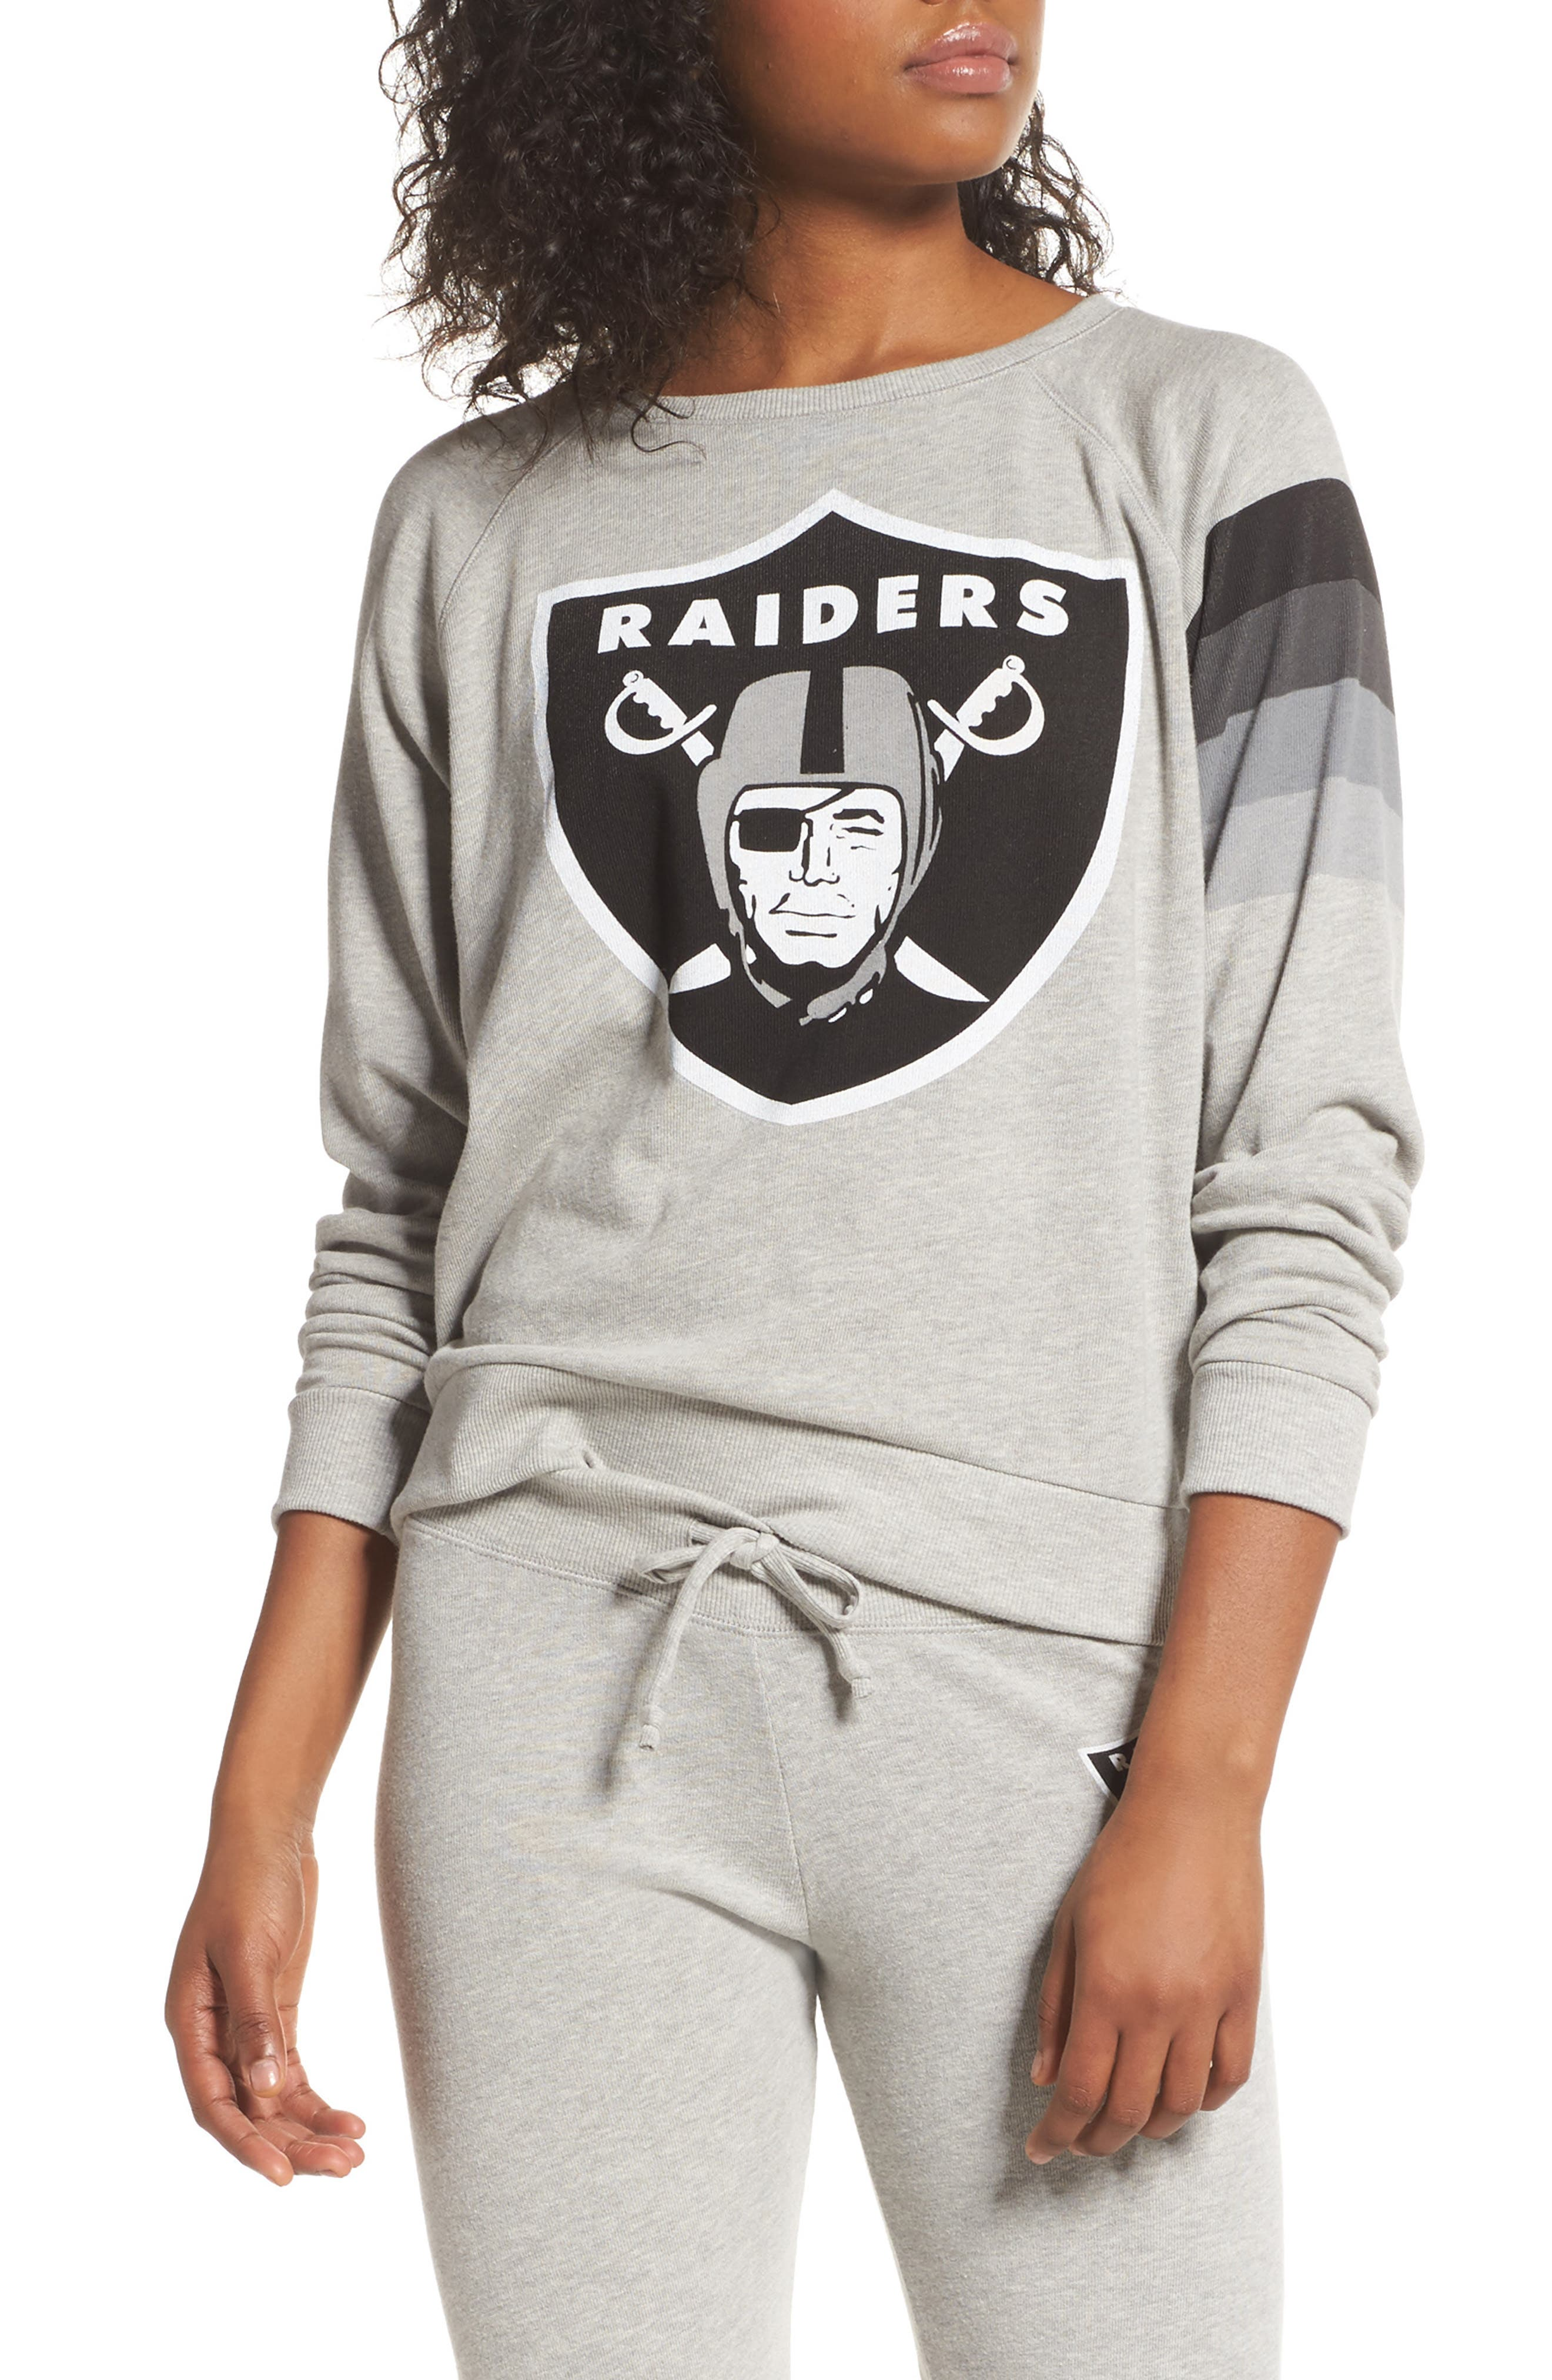 Alternate Image 1 Selected - Junk Food NFL Oakland Raiders Hacci Sweatshirt (Nordstrom Exclusive)